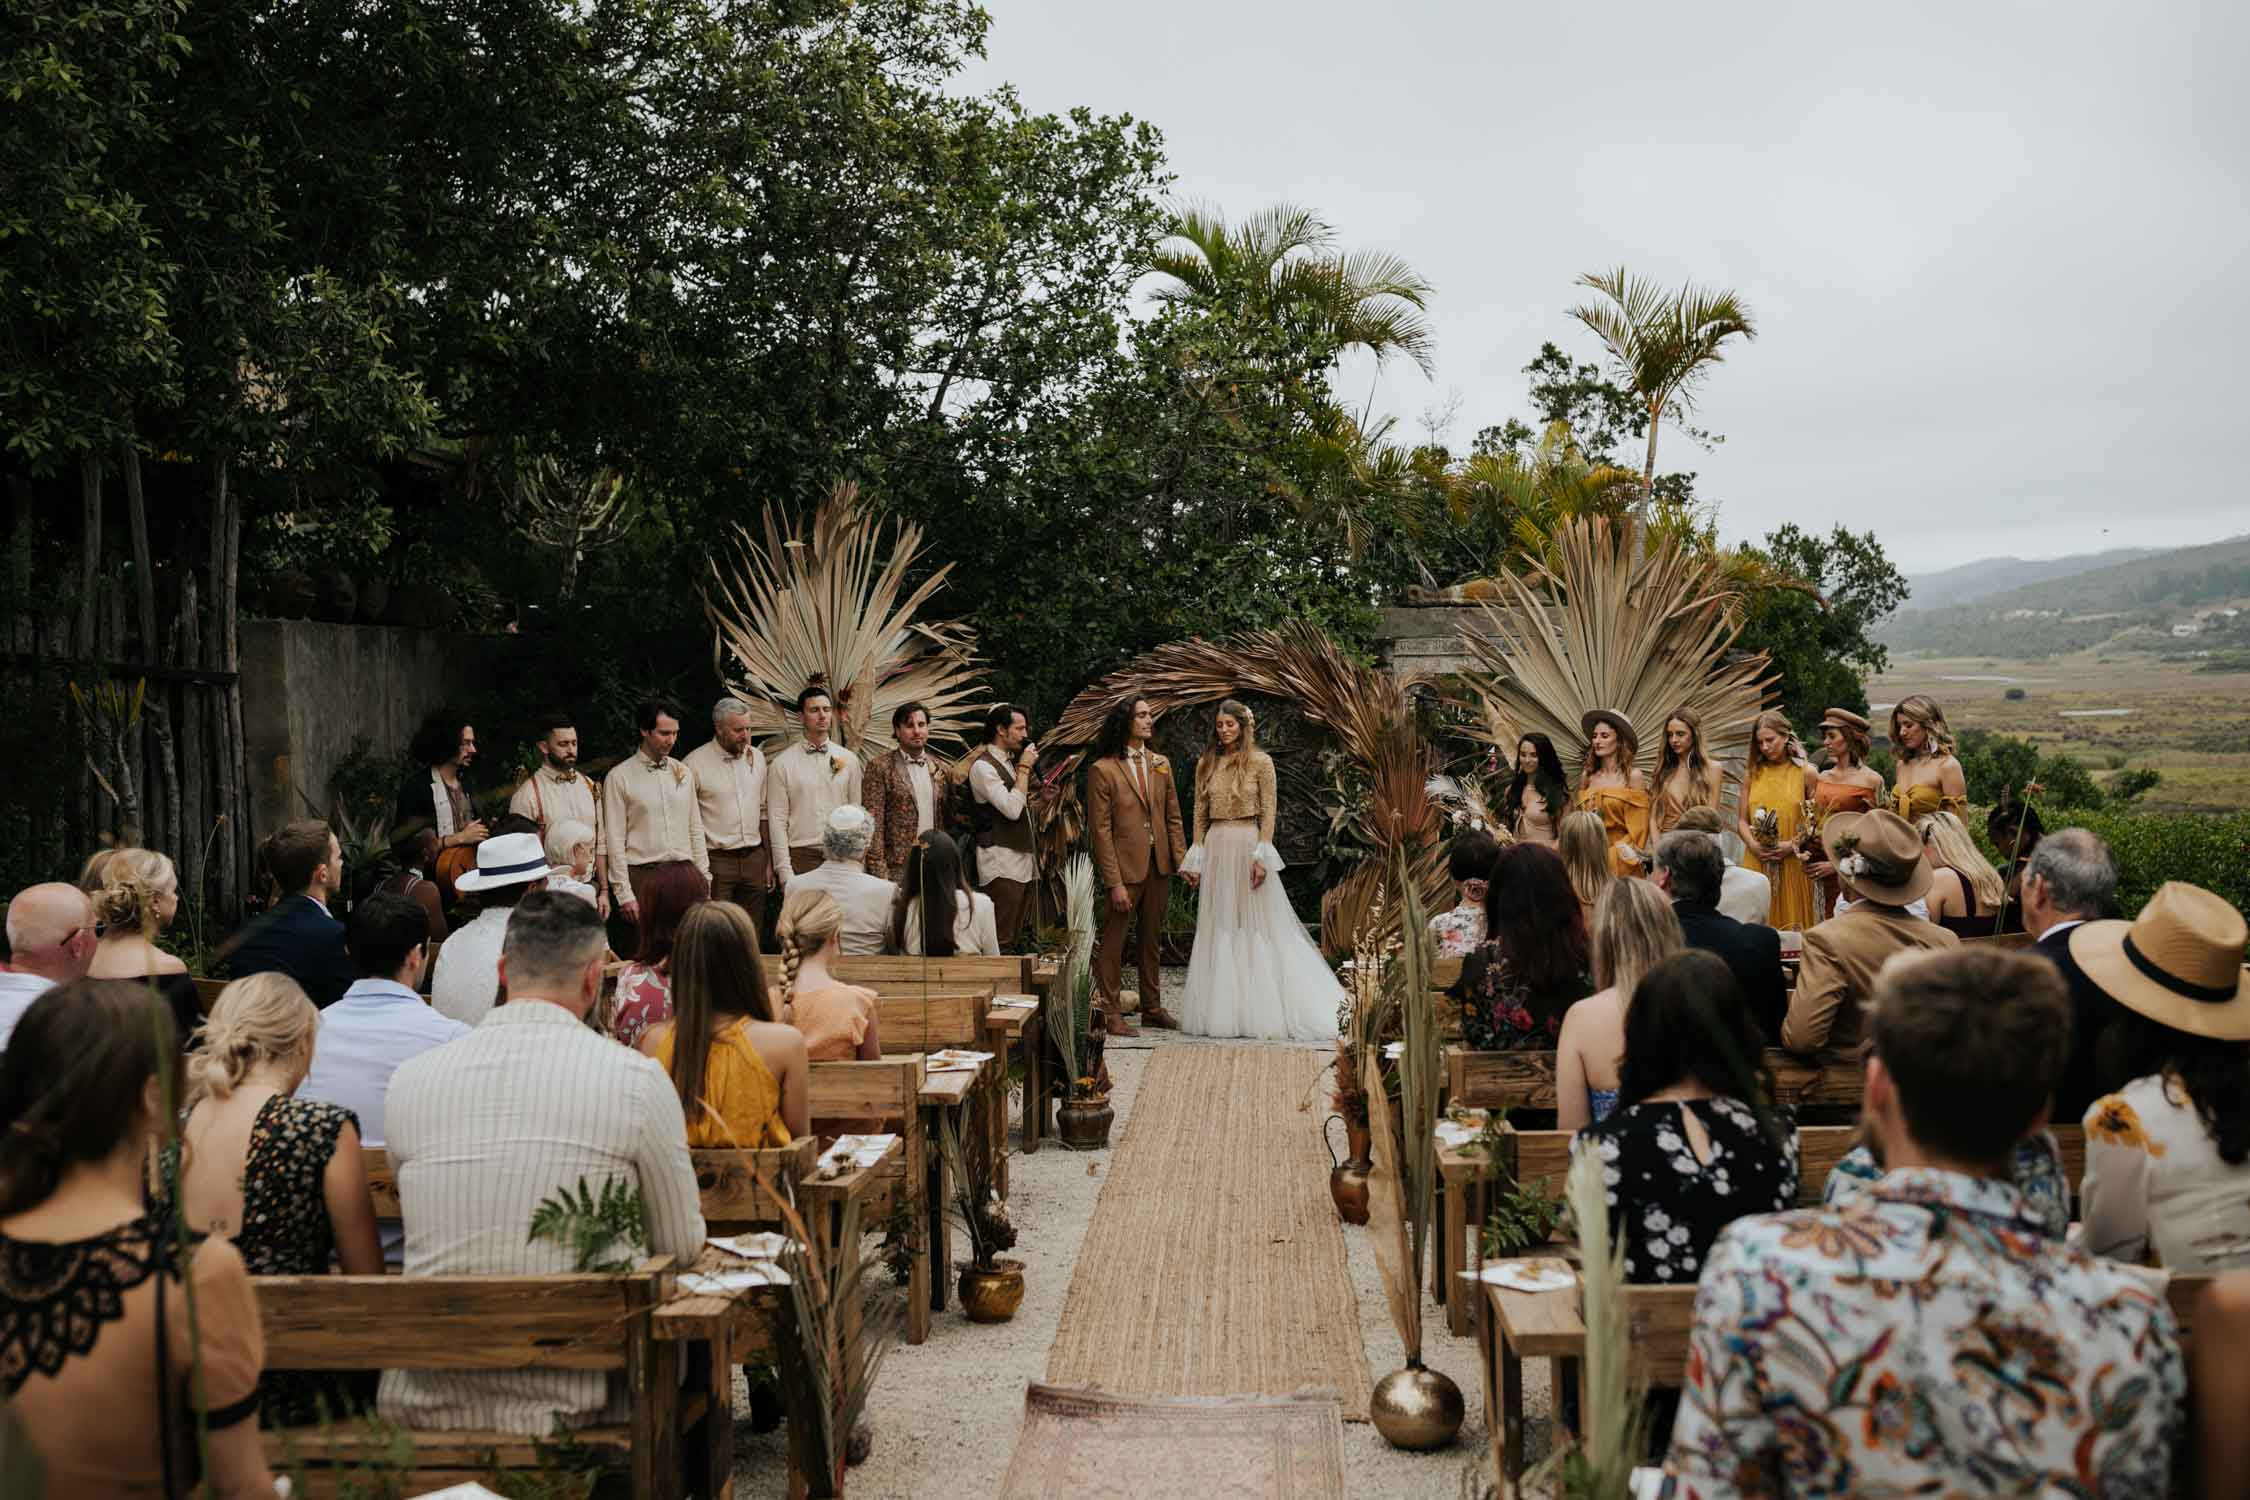 Wedding ceremony inspiration for outdoor boho gypsy wedding ceremony